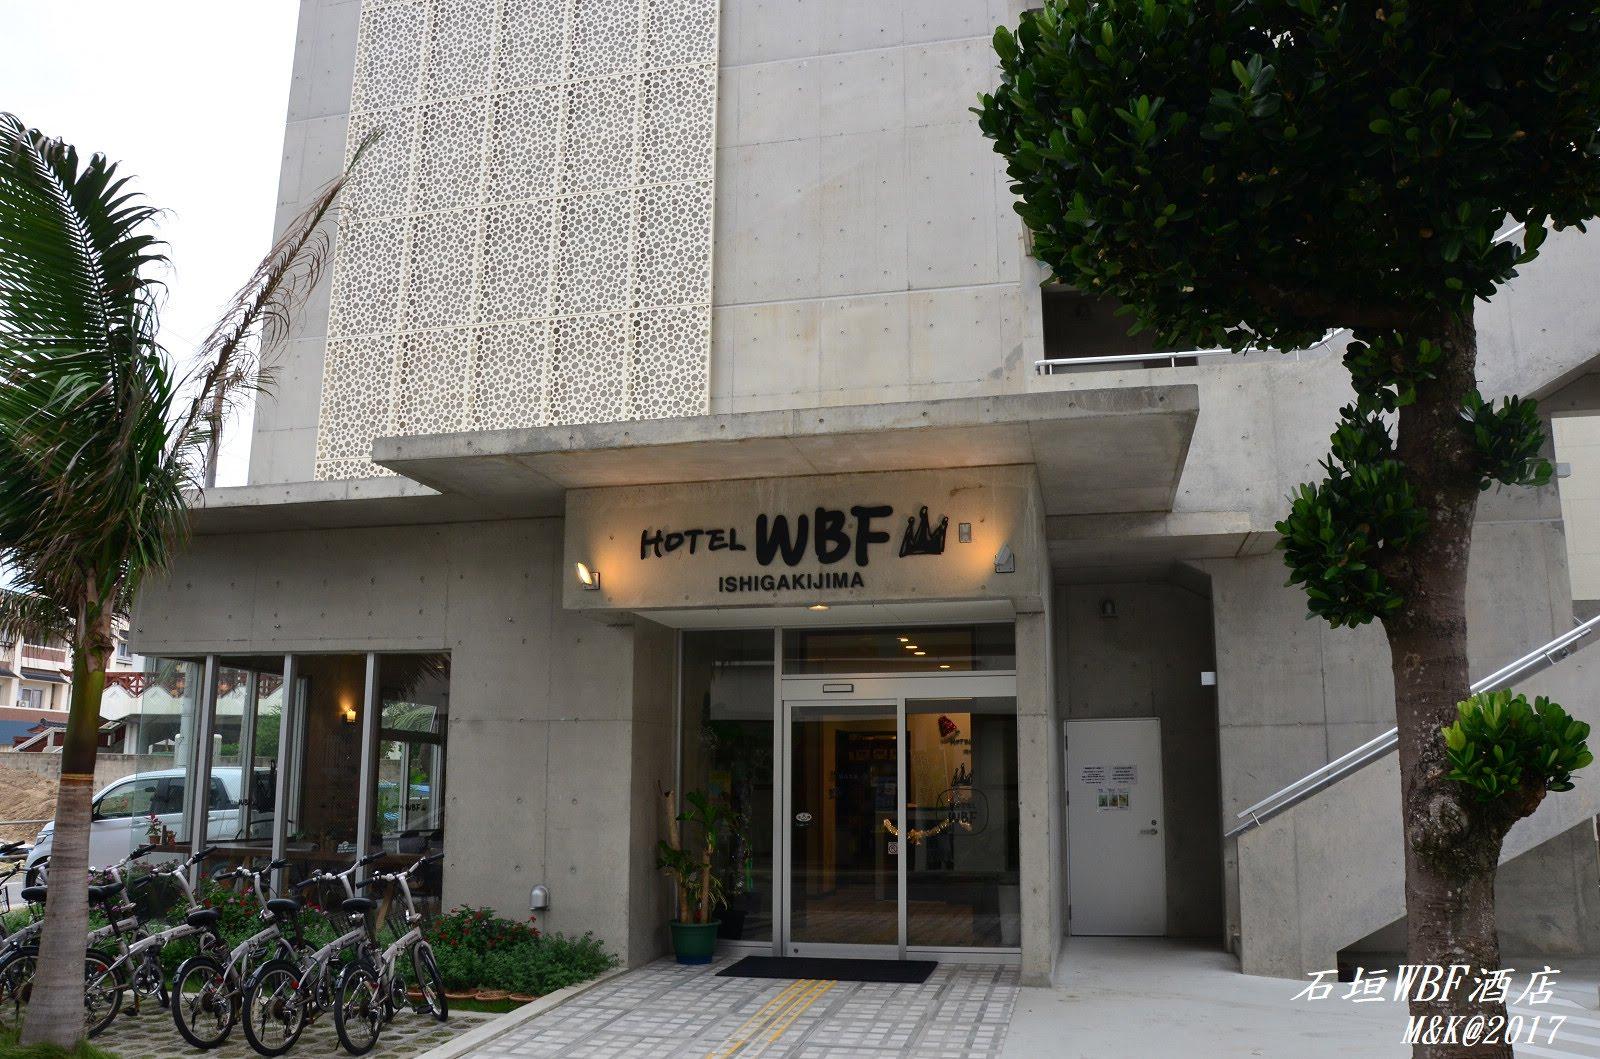 M & K 的遊記: 2017 石垣4天自駕慢活之旅 - ホテルWBF石垣島